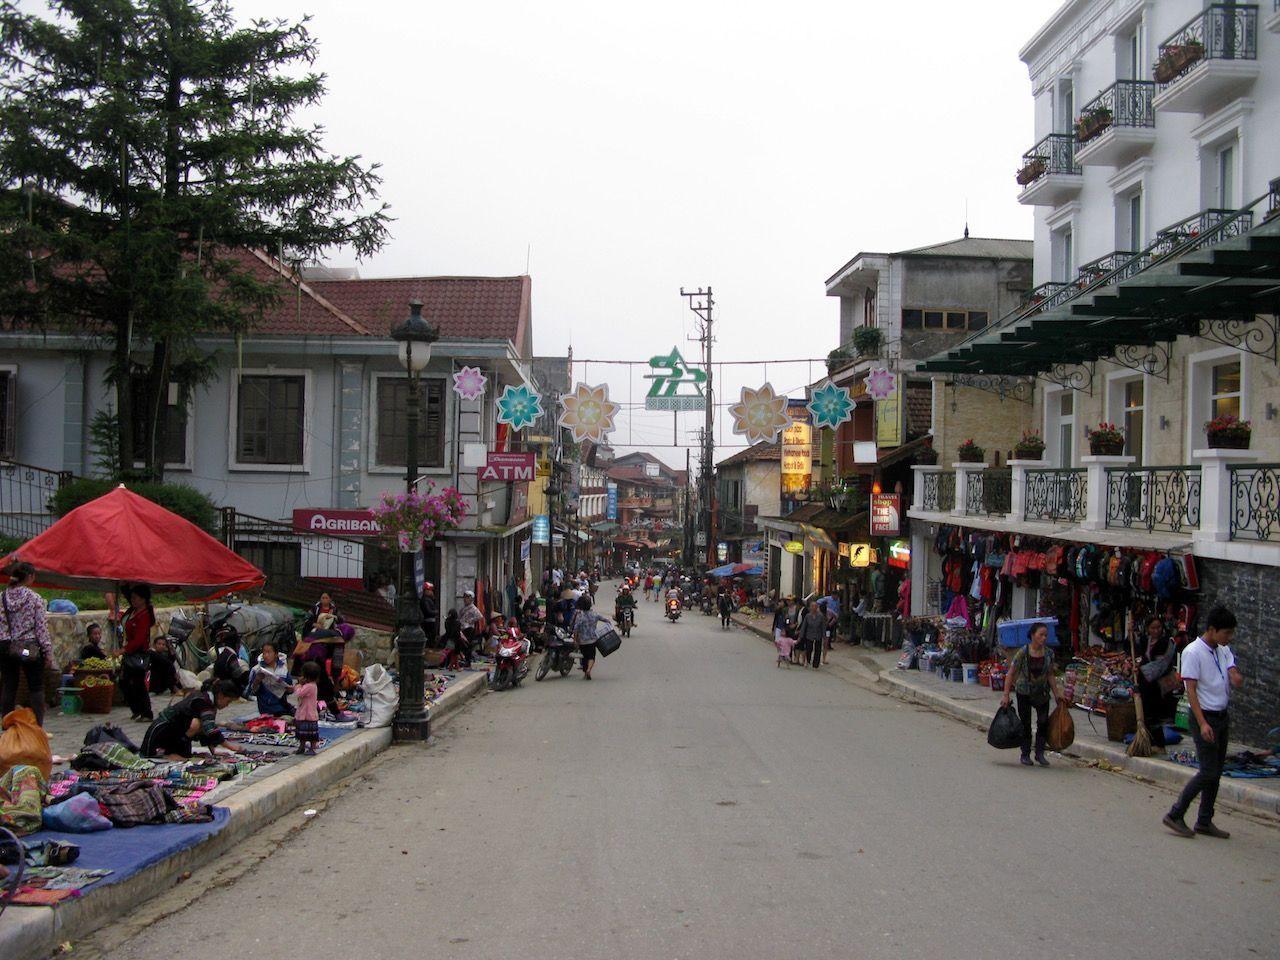 Calle de tiendas en Sapa